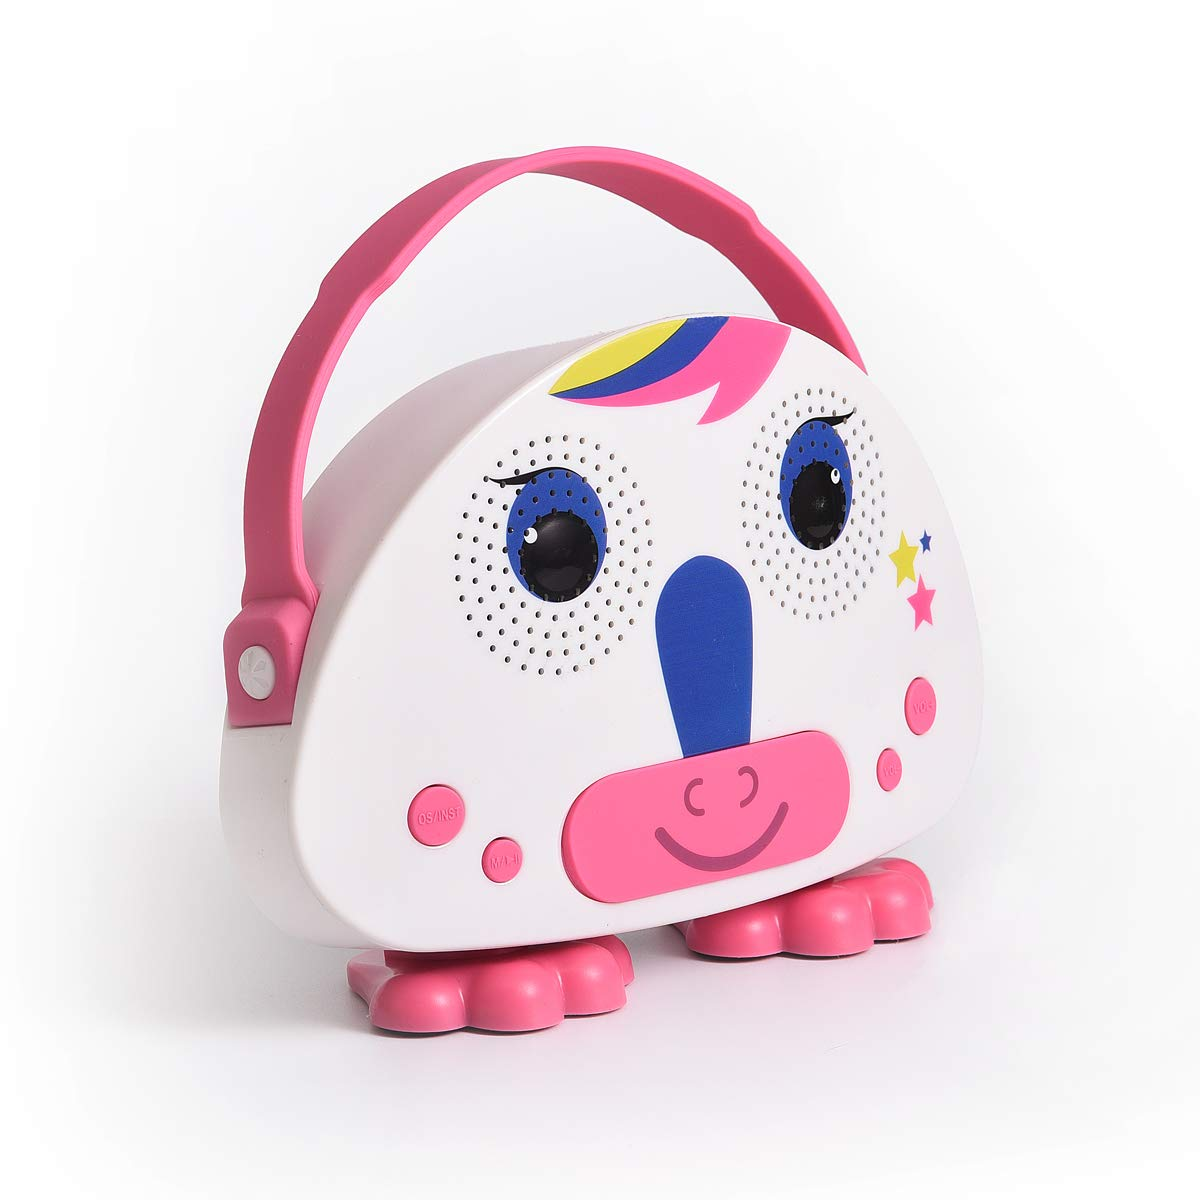 HowQ Outdoor Toys Karaoke Machine , Portable Kids Karaoke Bluetooth Speaker Wireless Cartoon Speaker for Kids for Indoor Toys Travel Activities with Microphone Karaoke Machine(Pink-White) by HowQ (Image #4)